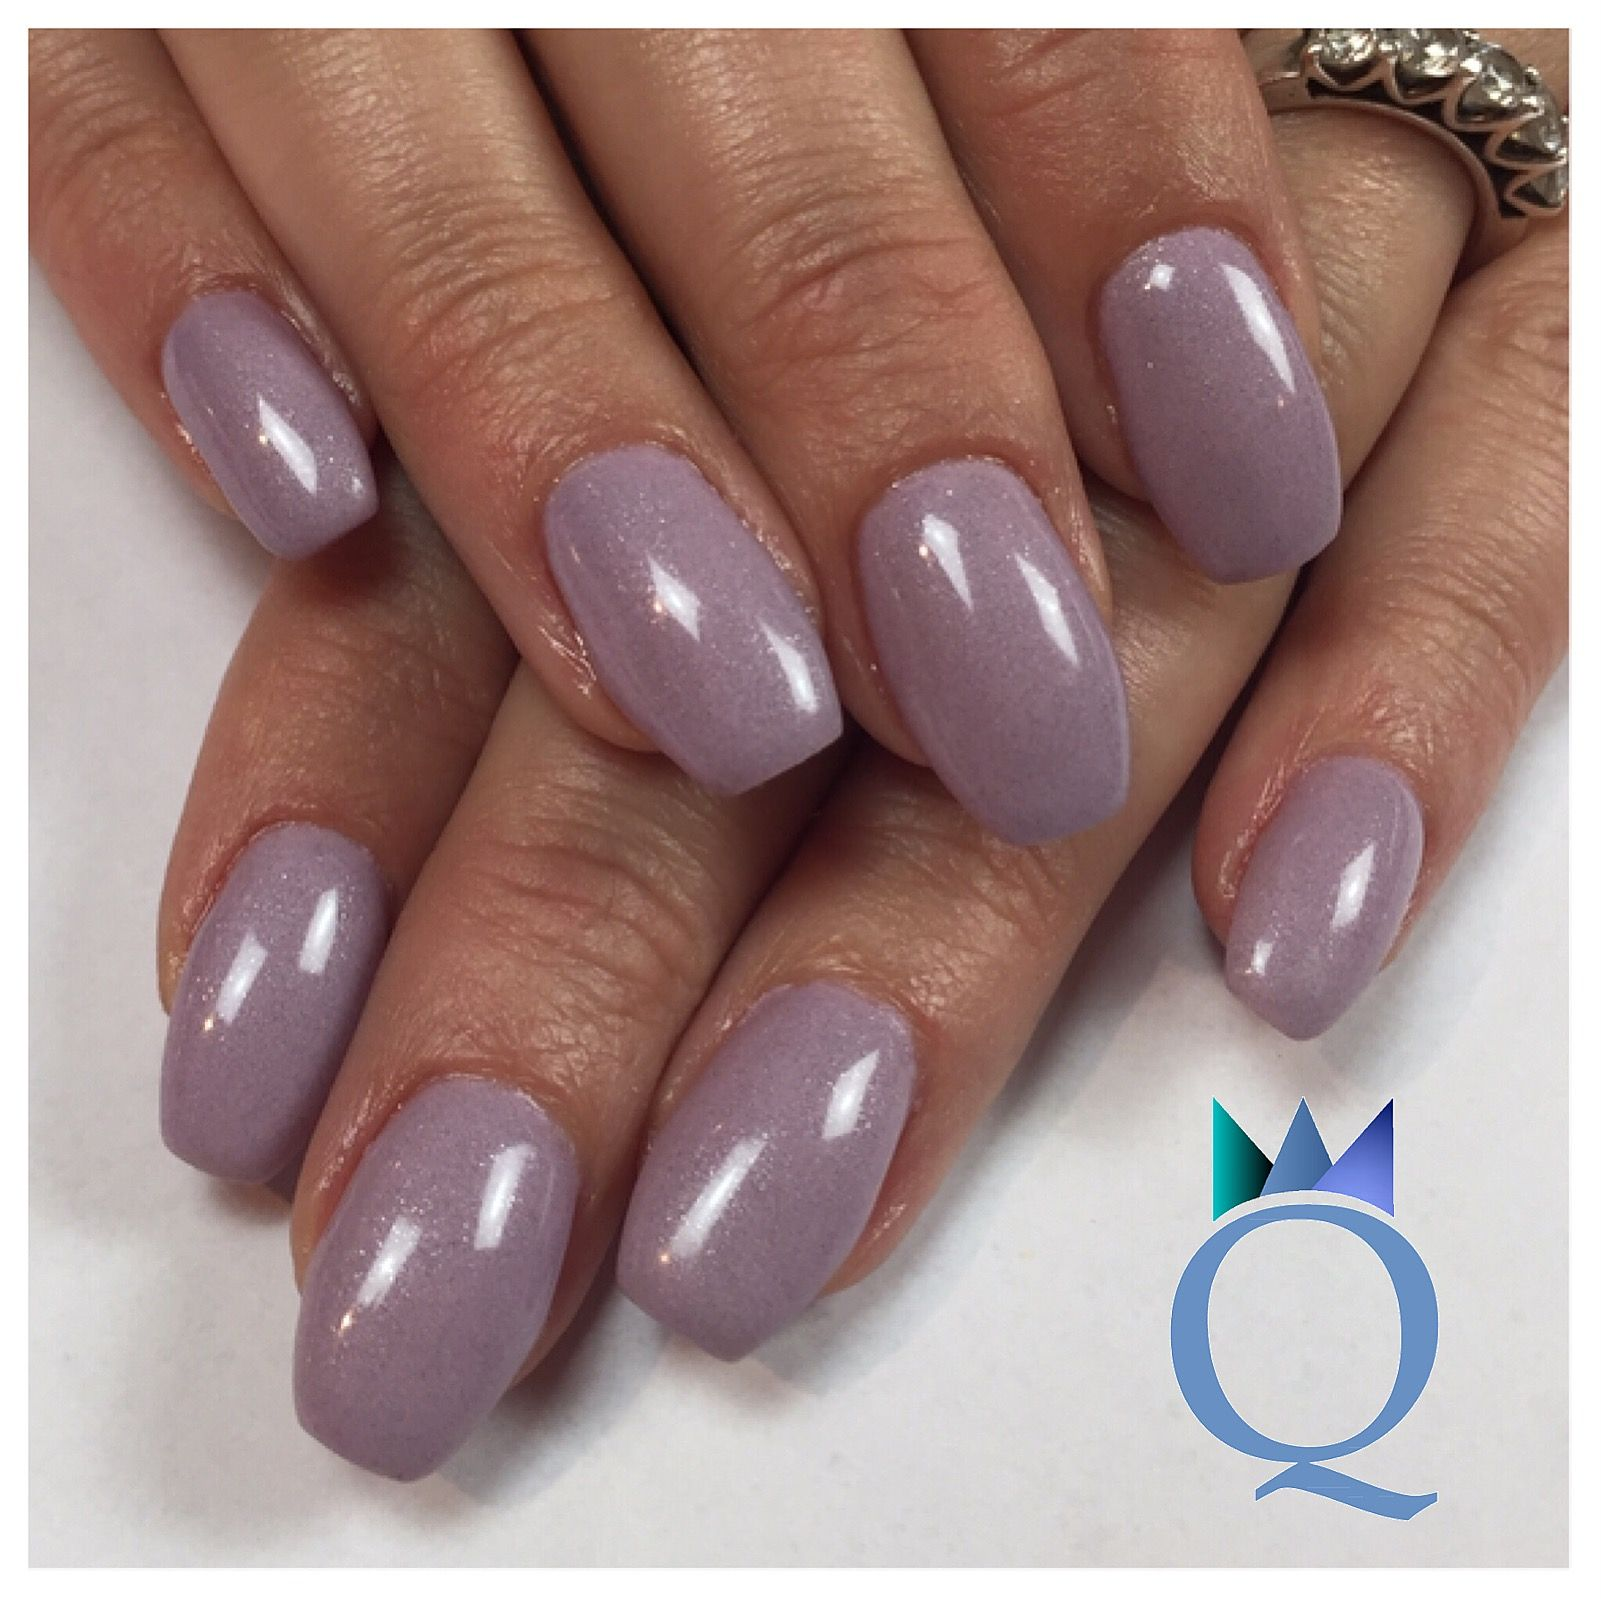 coffinnails gelnails nails lilac ballerinaform. Black Bedroom Furniture Sets. Home Design Ideas